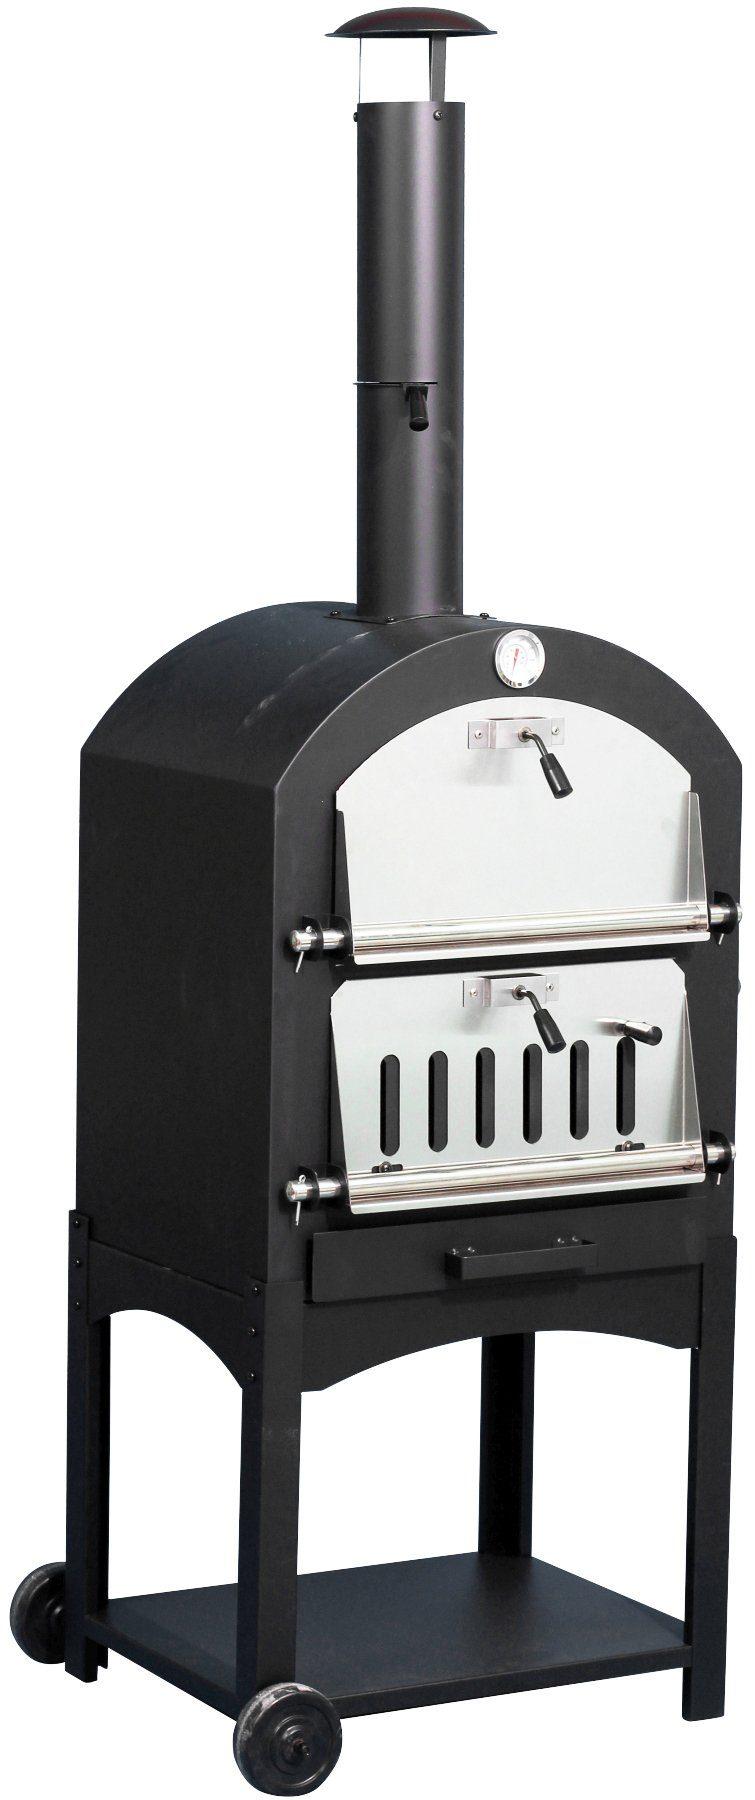 EL FUEGO Pizzaofen »Napoli«, BxTxH: 56x38x35 cm